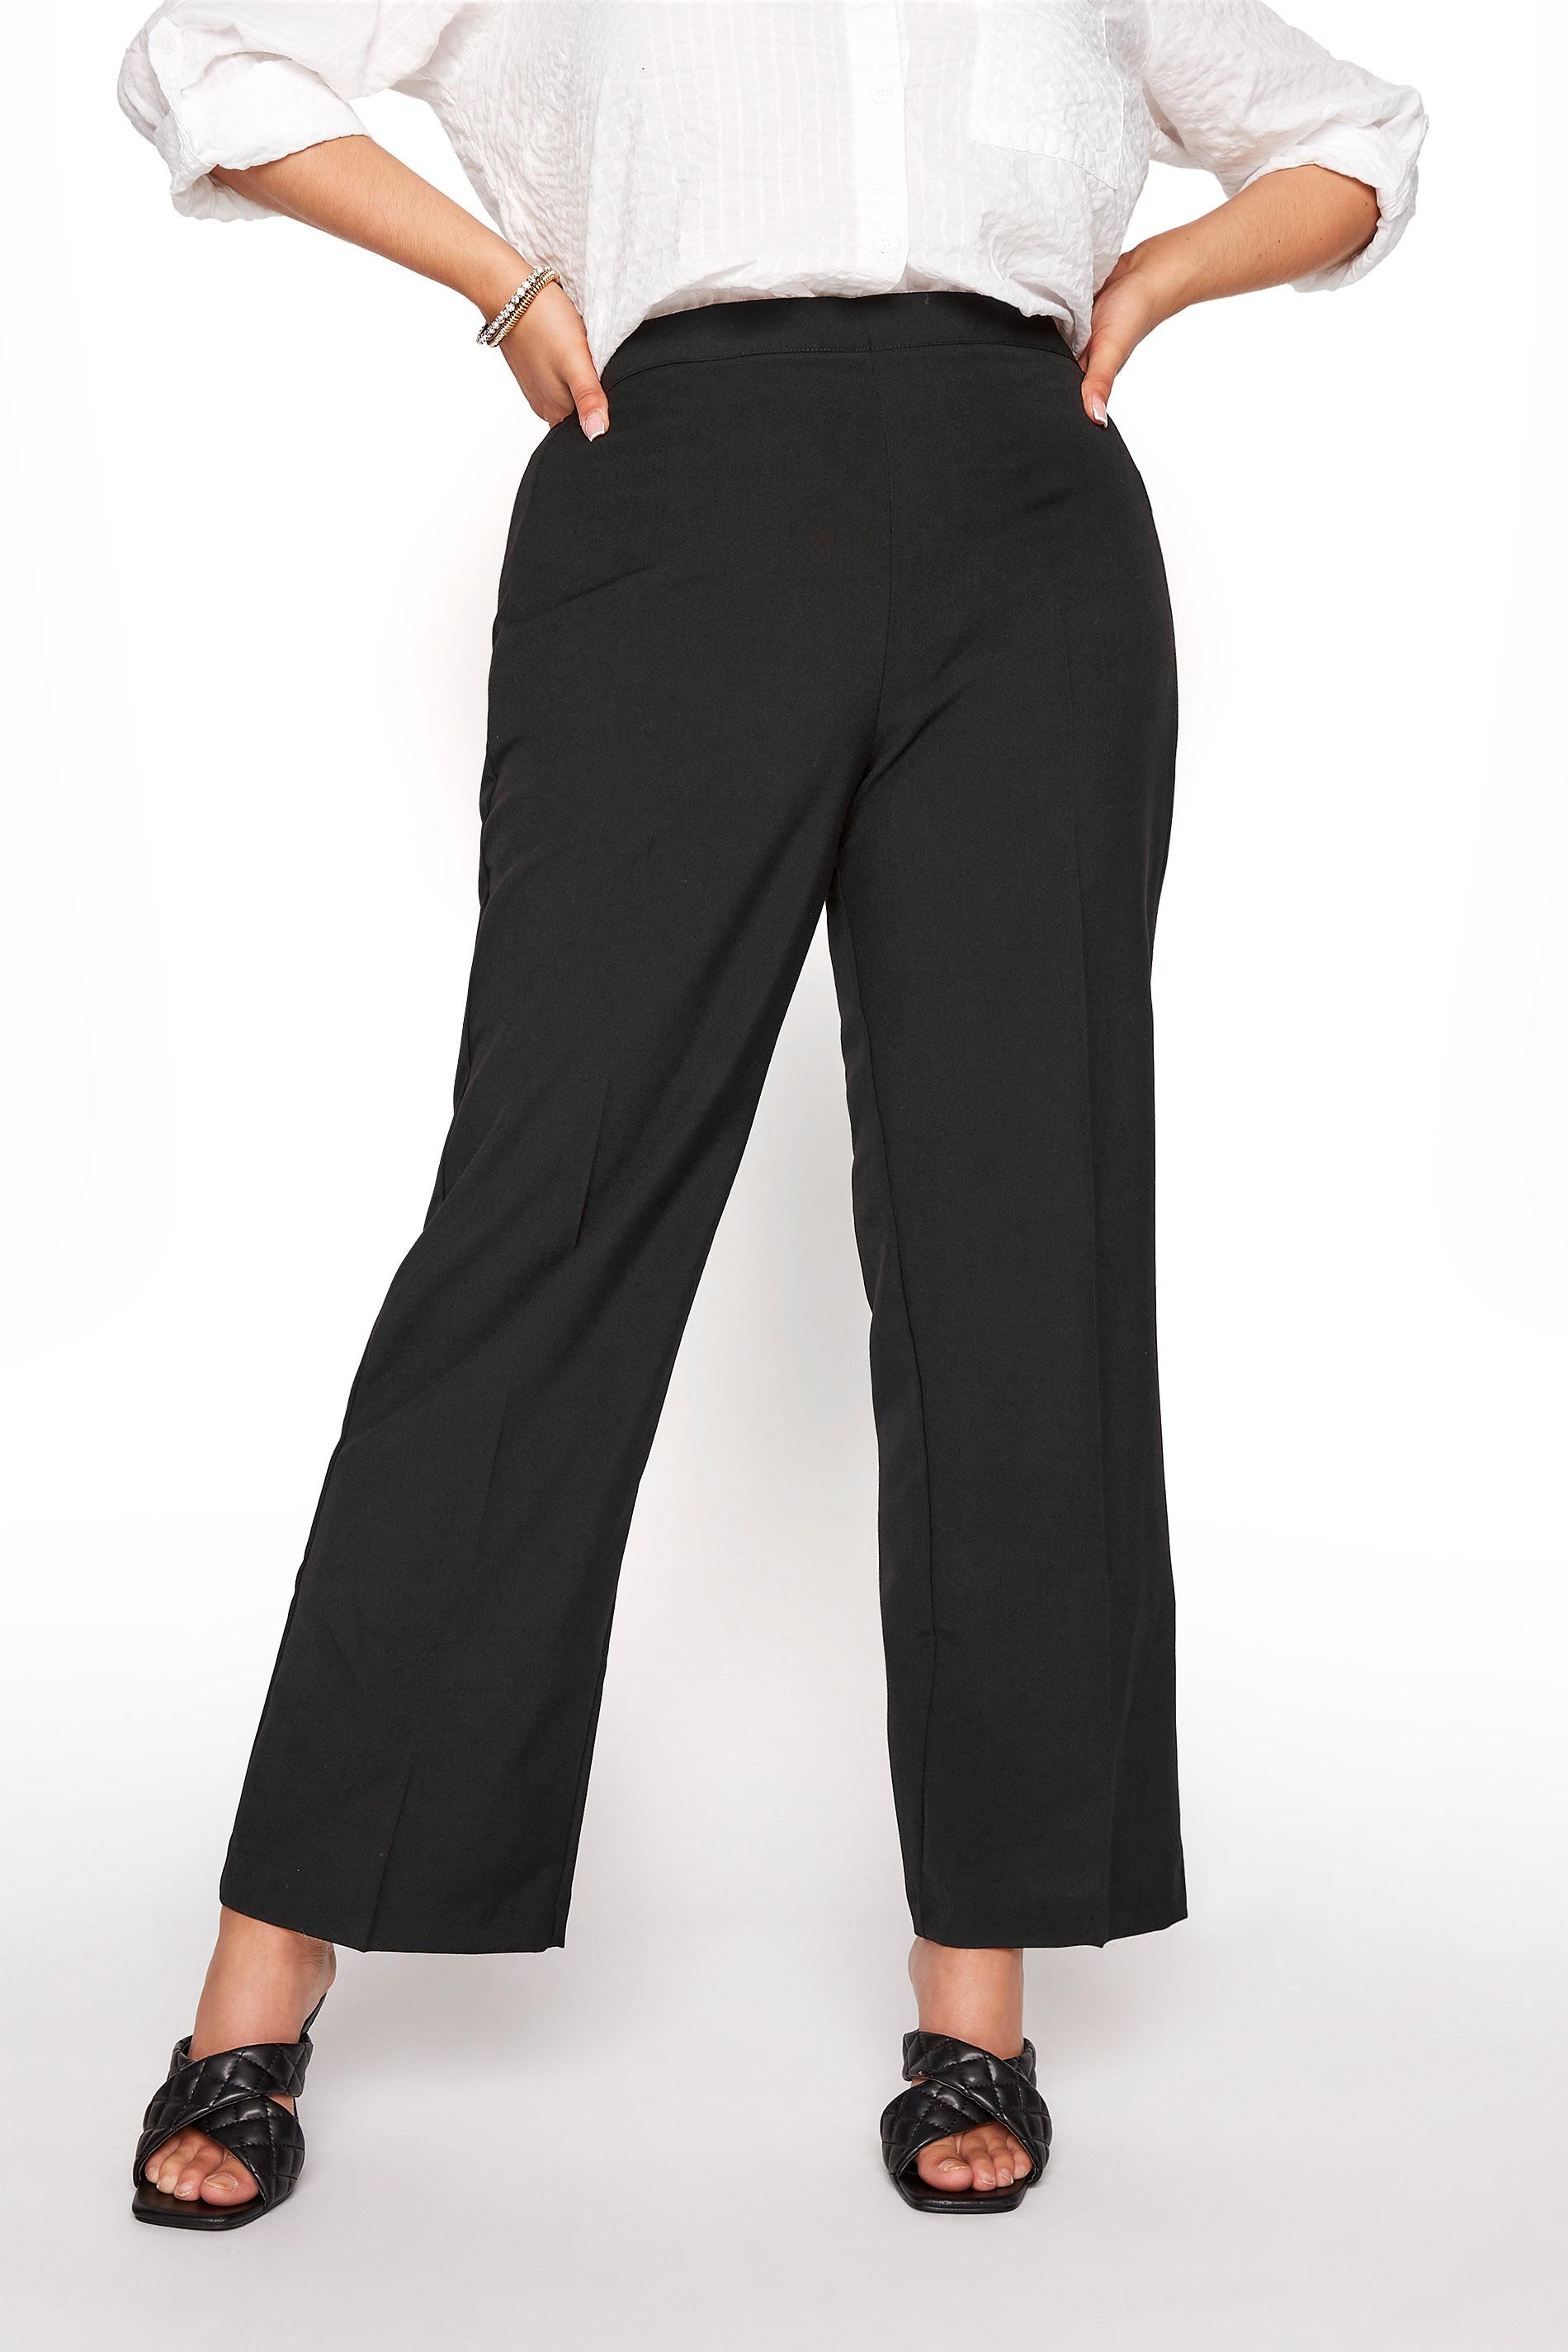 Black Classic Straight Leg Trousers With Elasticated Waistband_B.jpg